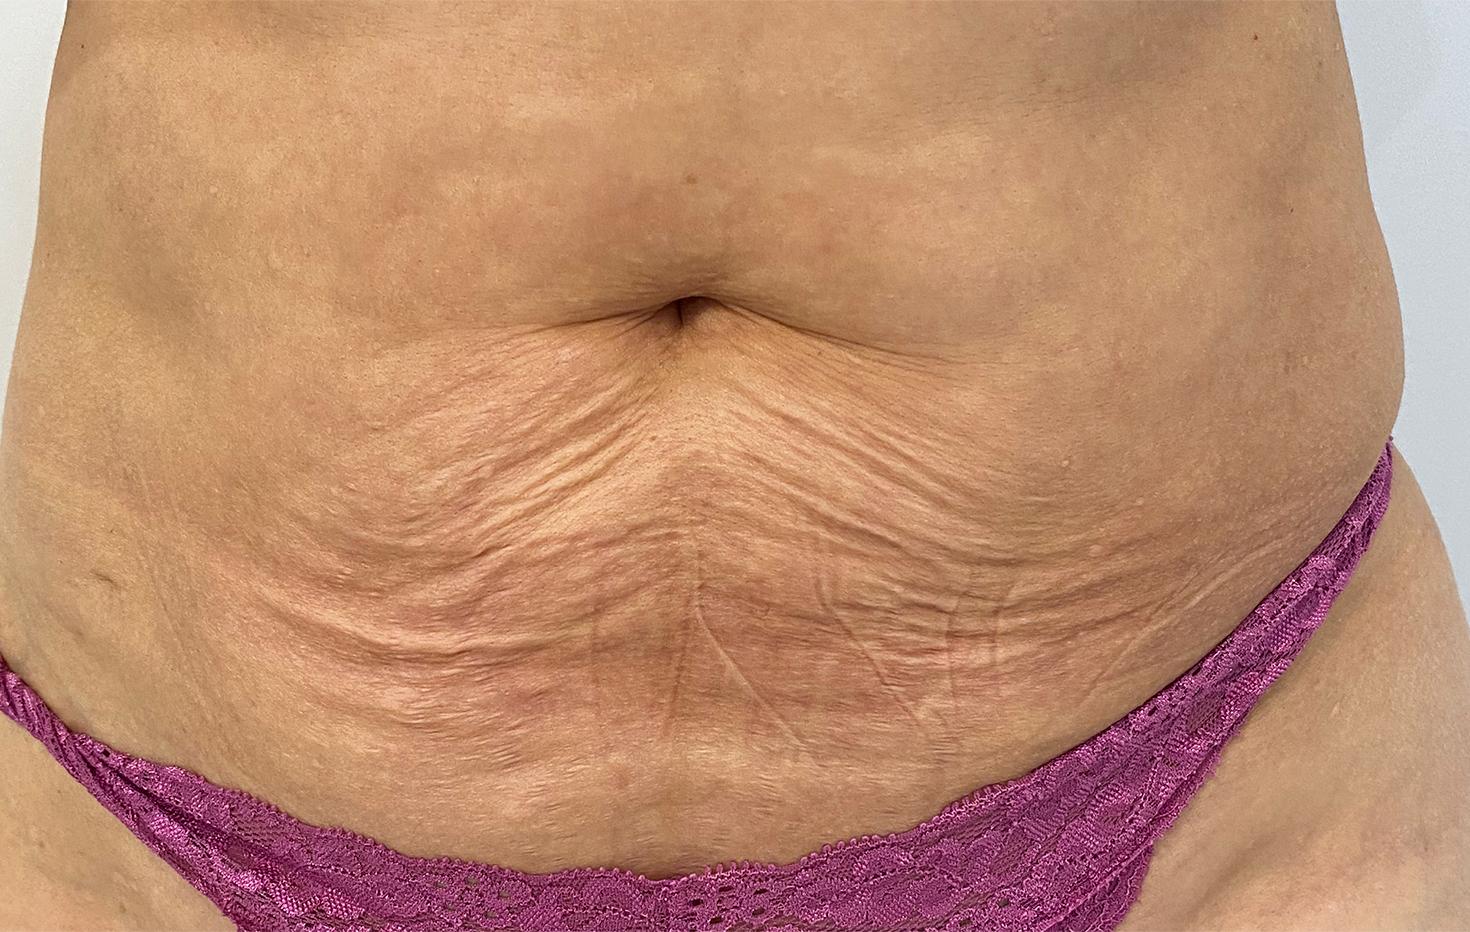 Skin Laxity Treatment